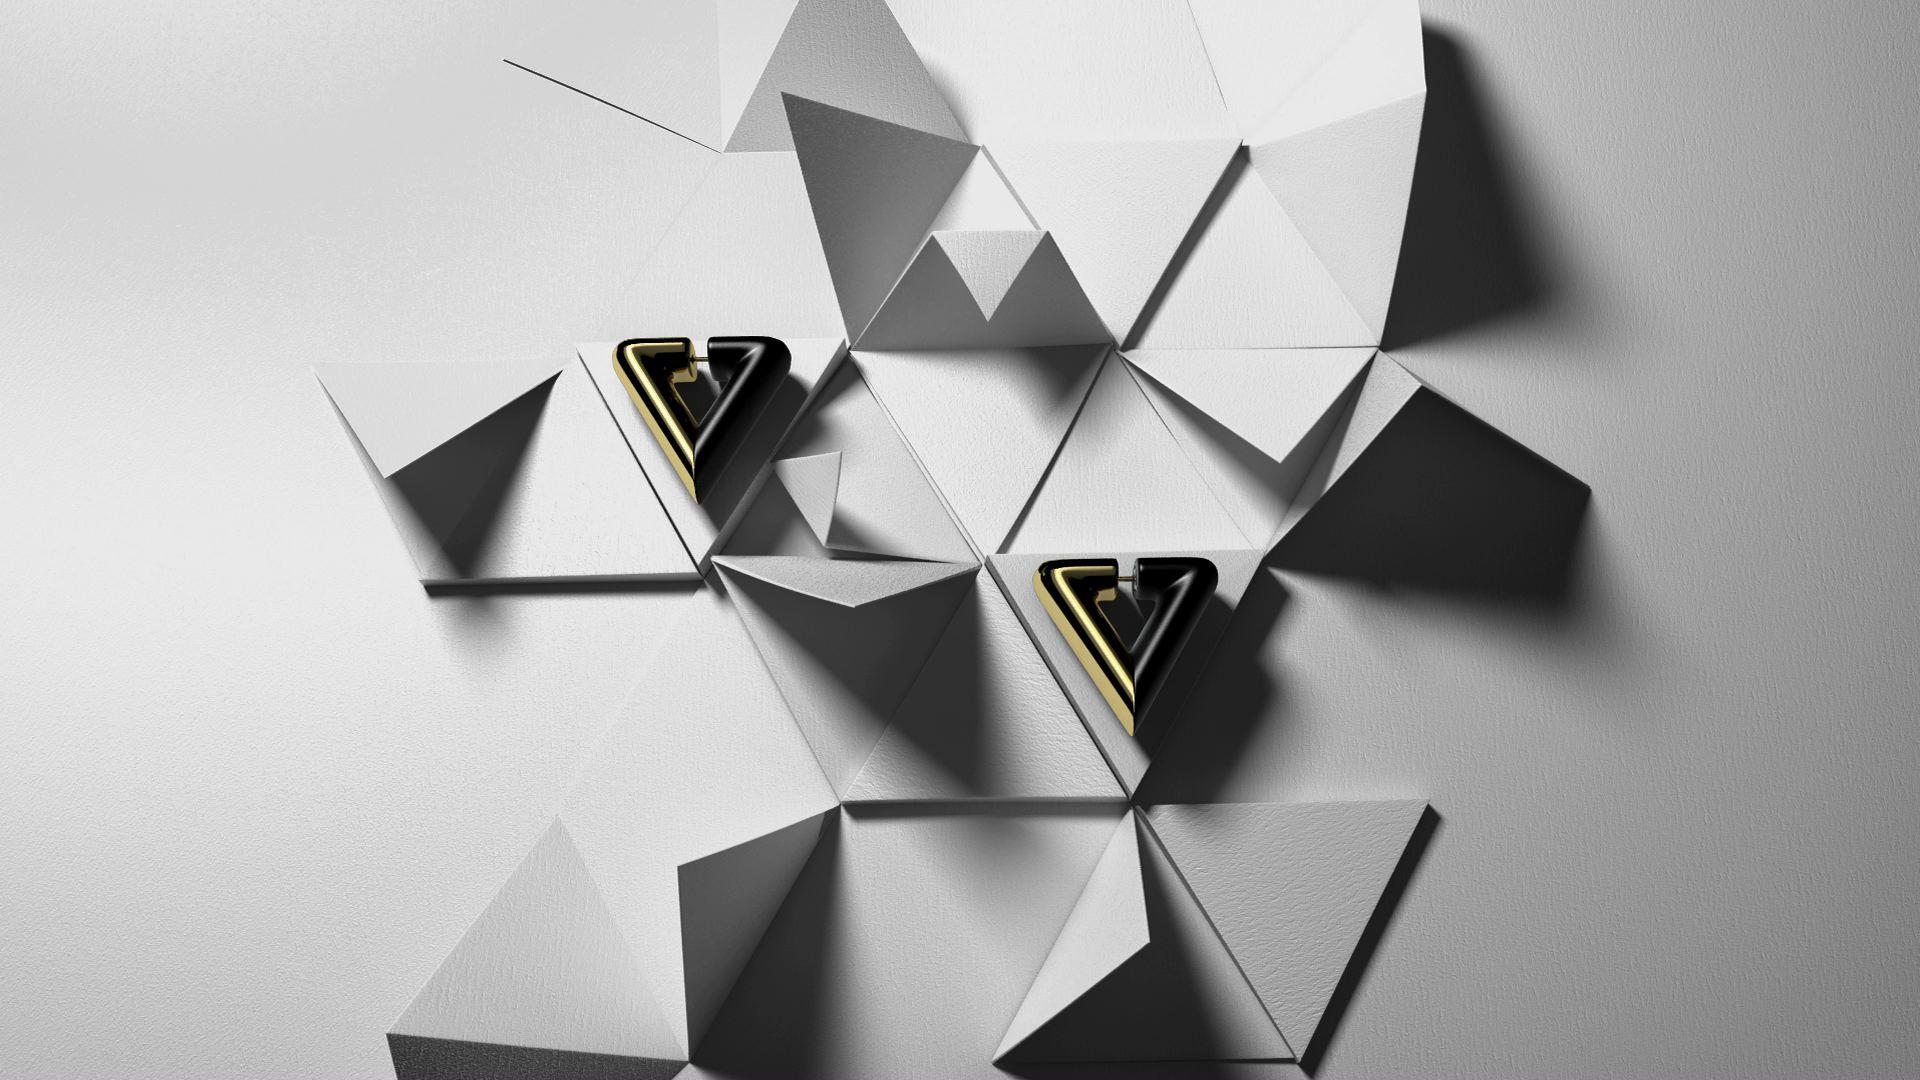 Louis Vuitton: The V Collection